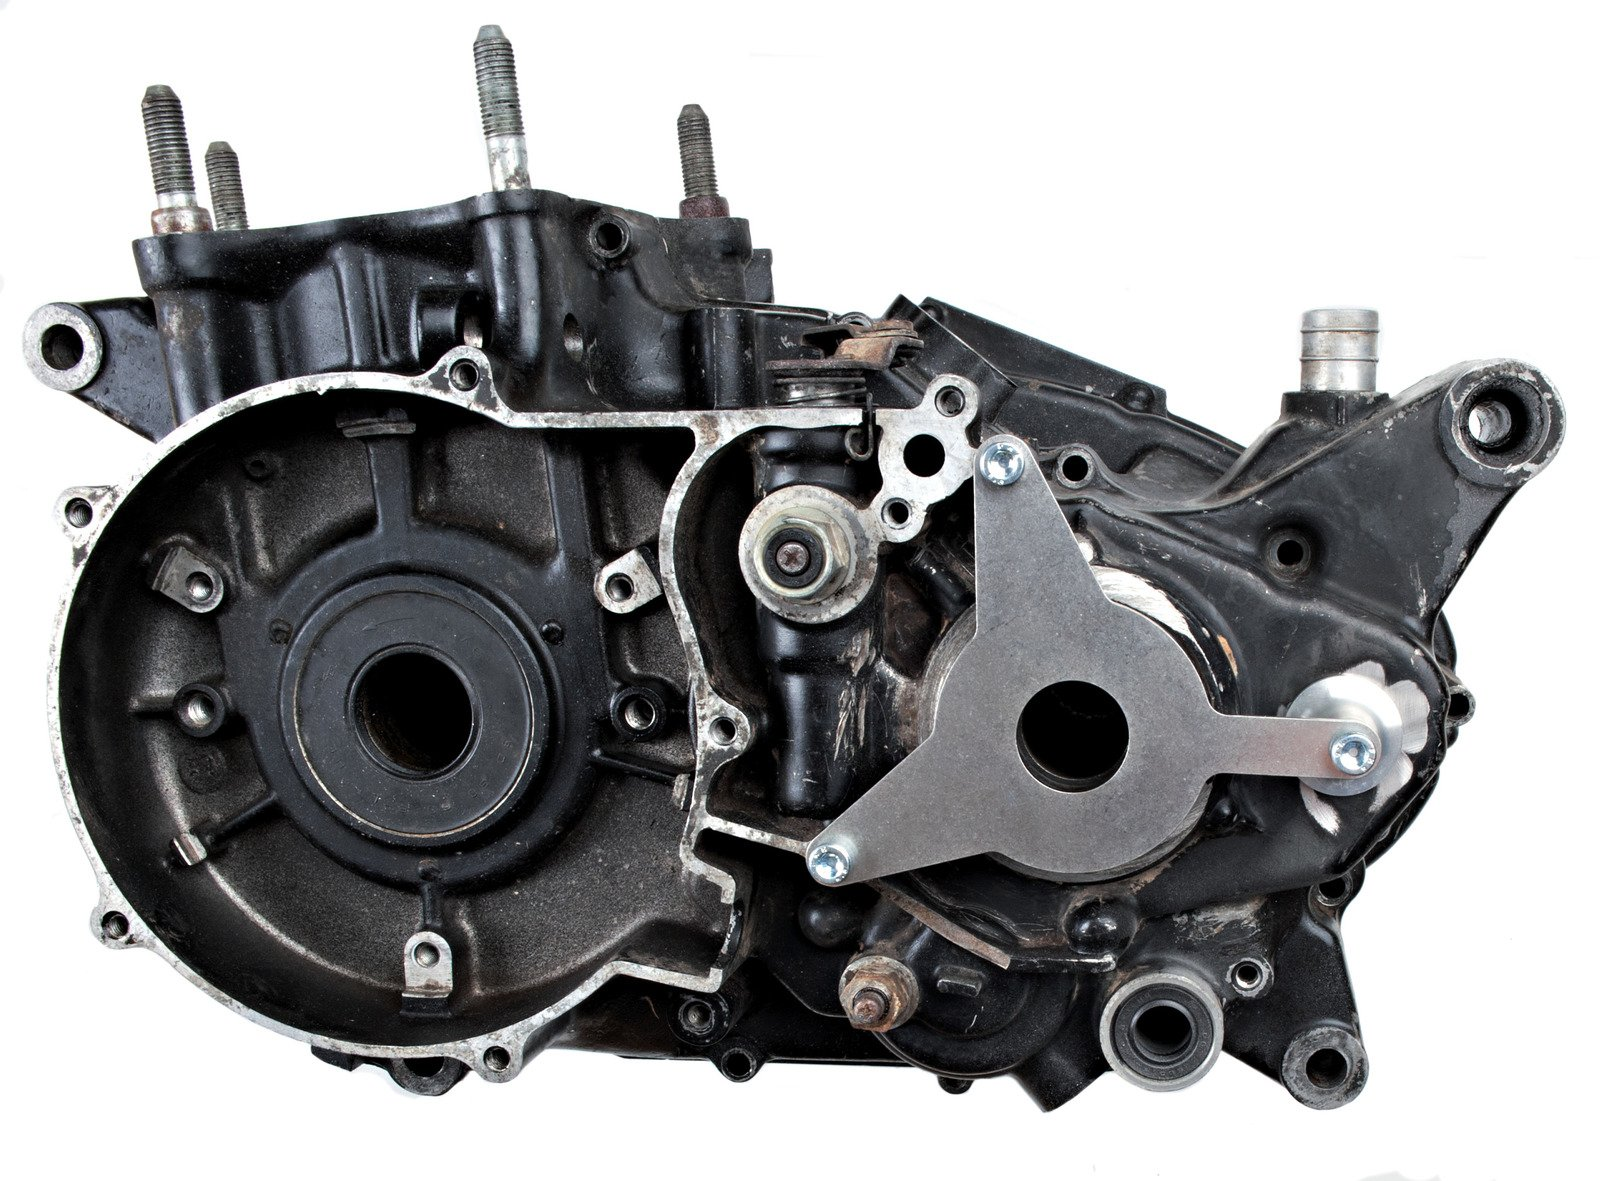 Yamaha SR400 SR500 TT500 XT500 Front Sprocket Cover Repair Kit 30-053